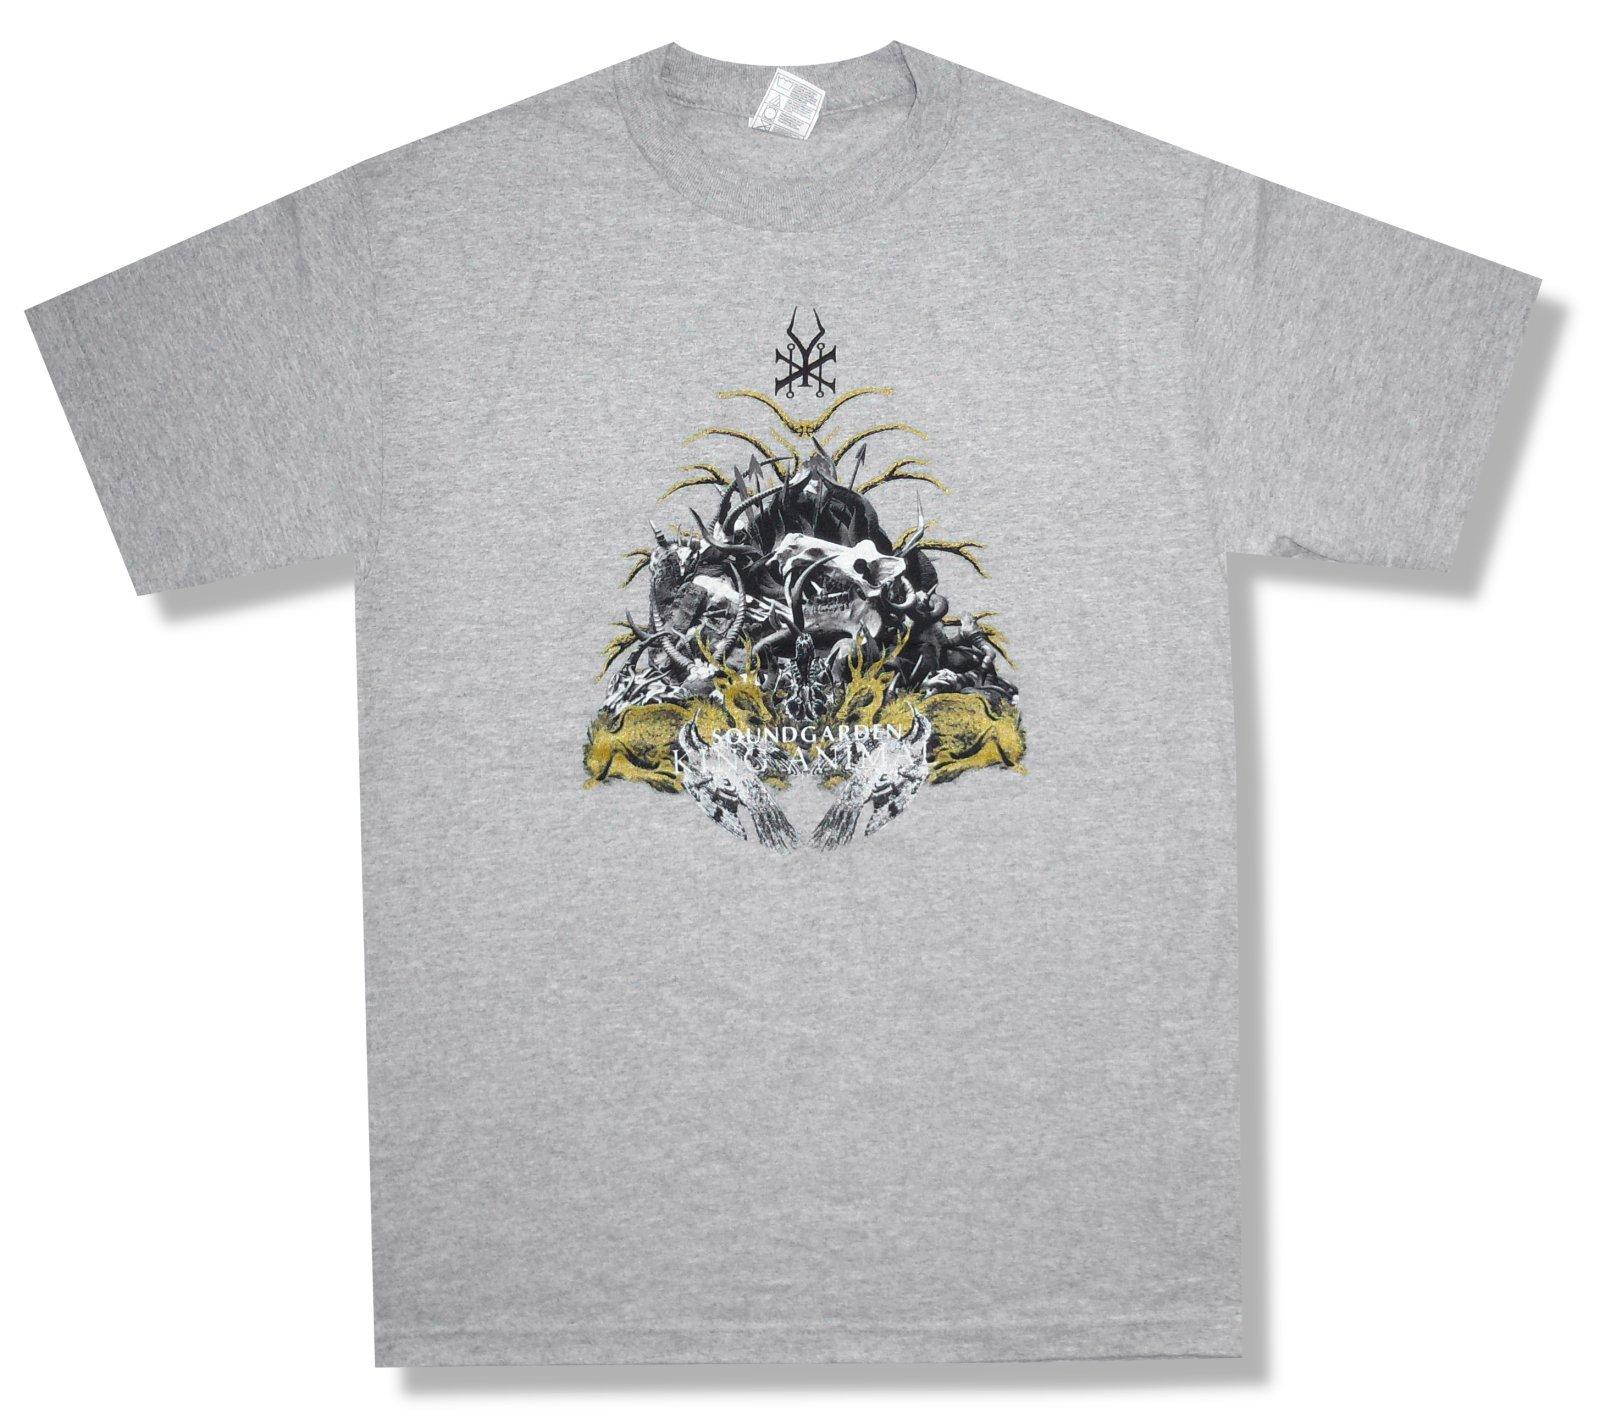 Soundgardenking Animal Tour 2013 Grey Shirts